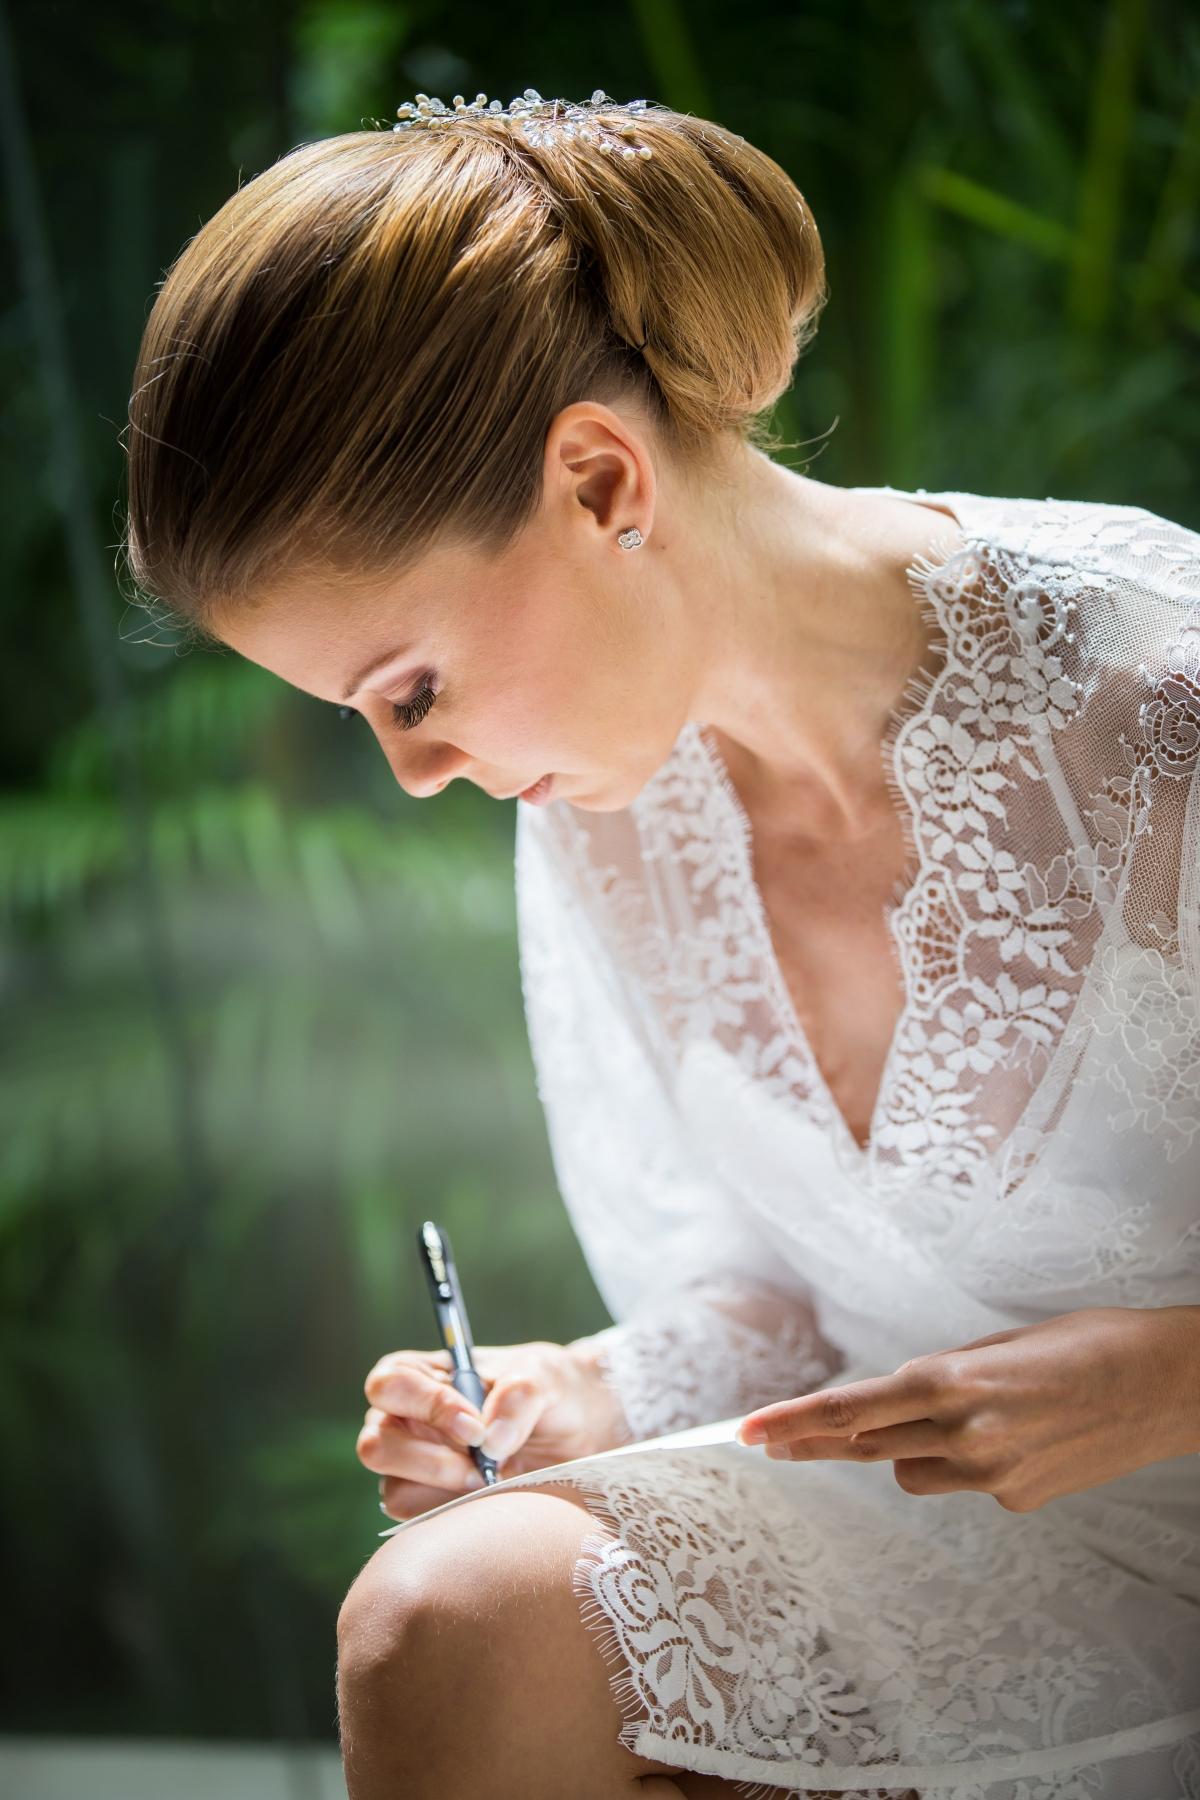 898_elizabeth medina photography 0038 Chable Wedding Photography: Confessions of a Yucatan Bride, Yucatan Destination Wedding Photography from A Merida Bride's Planning Diary